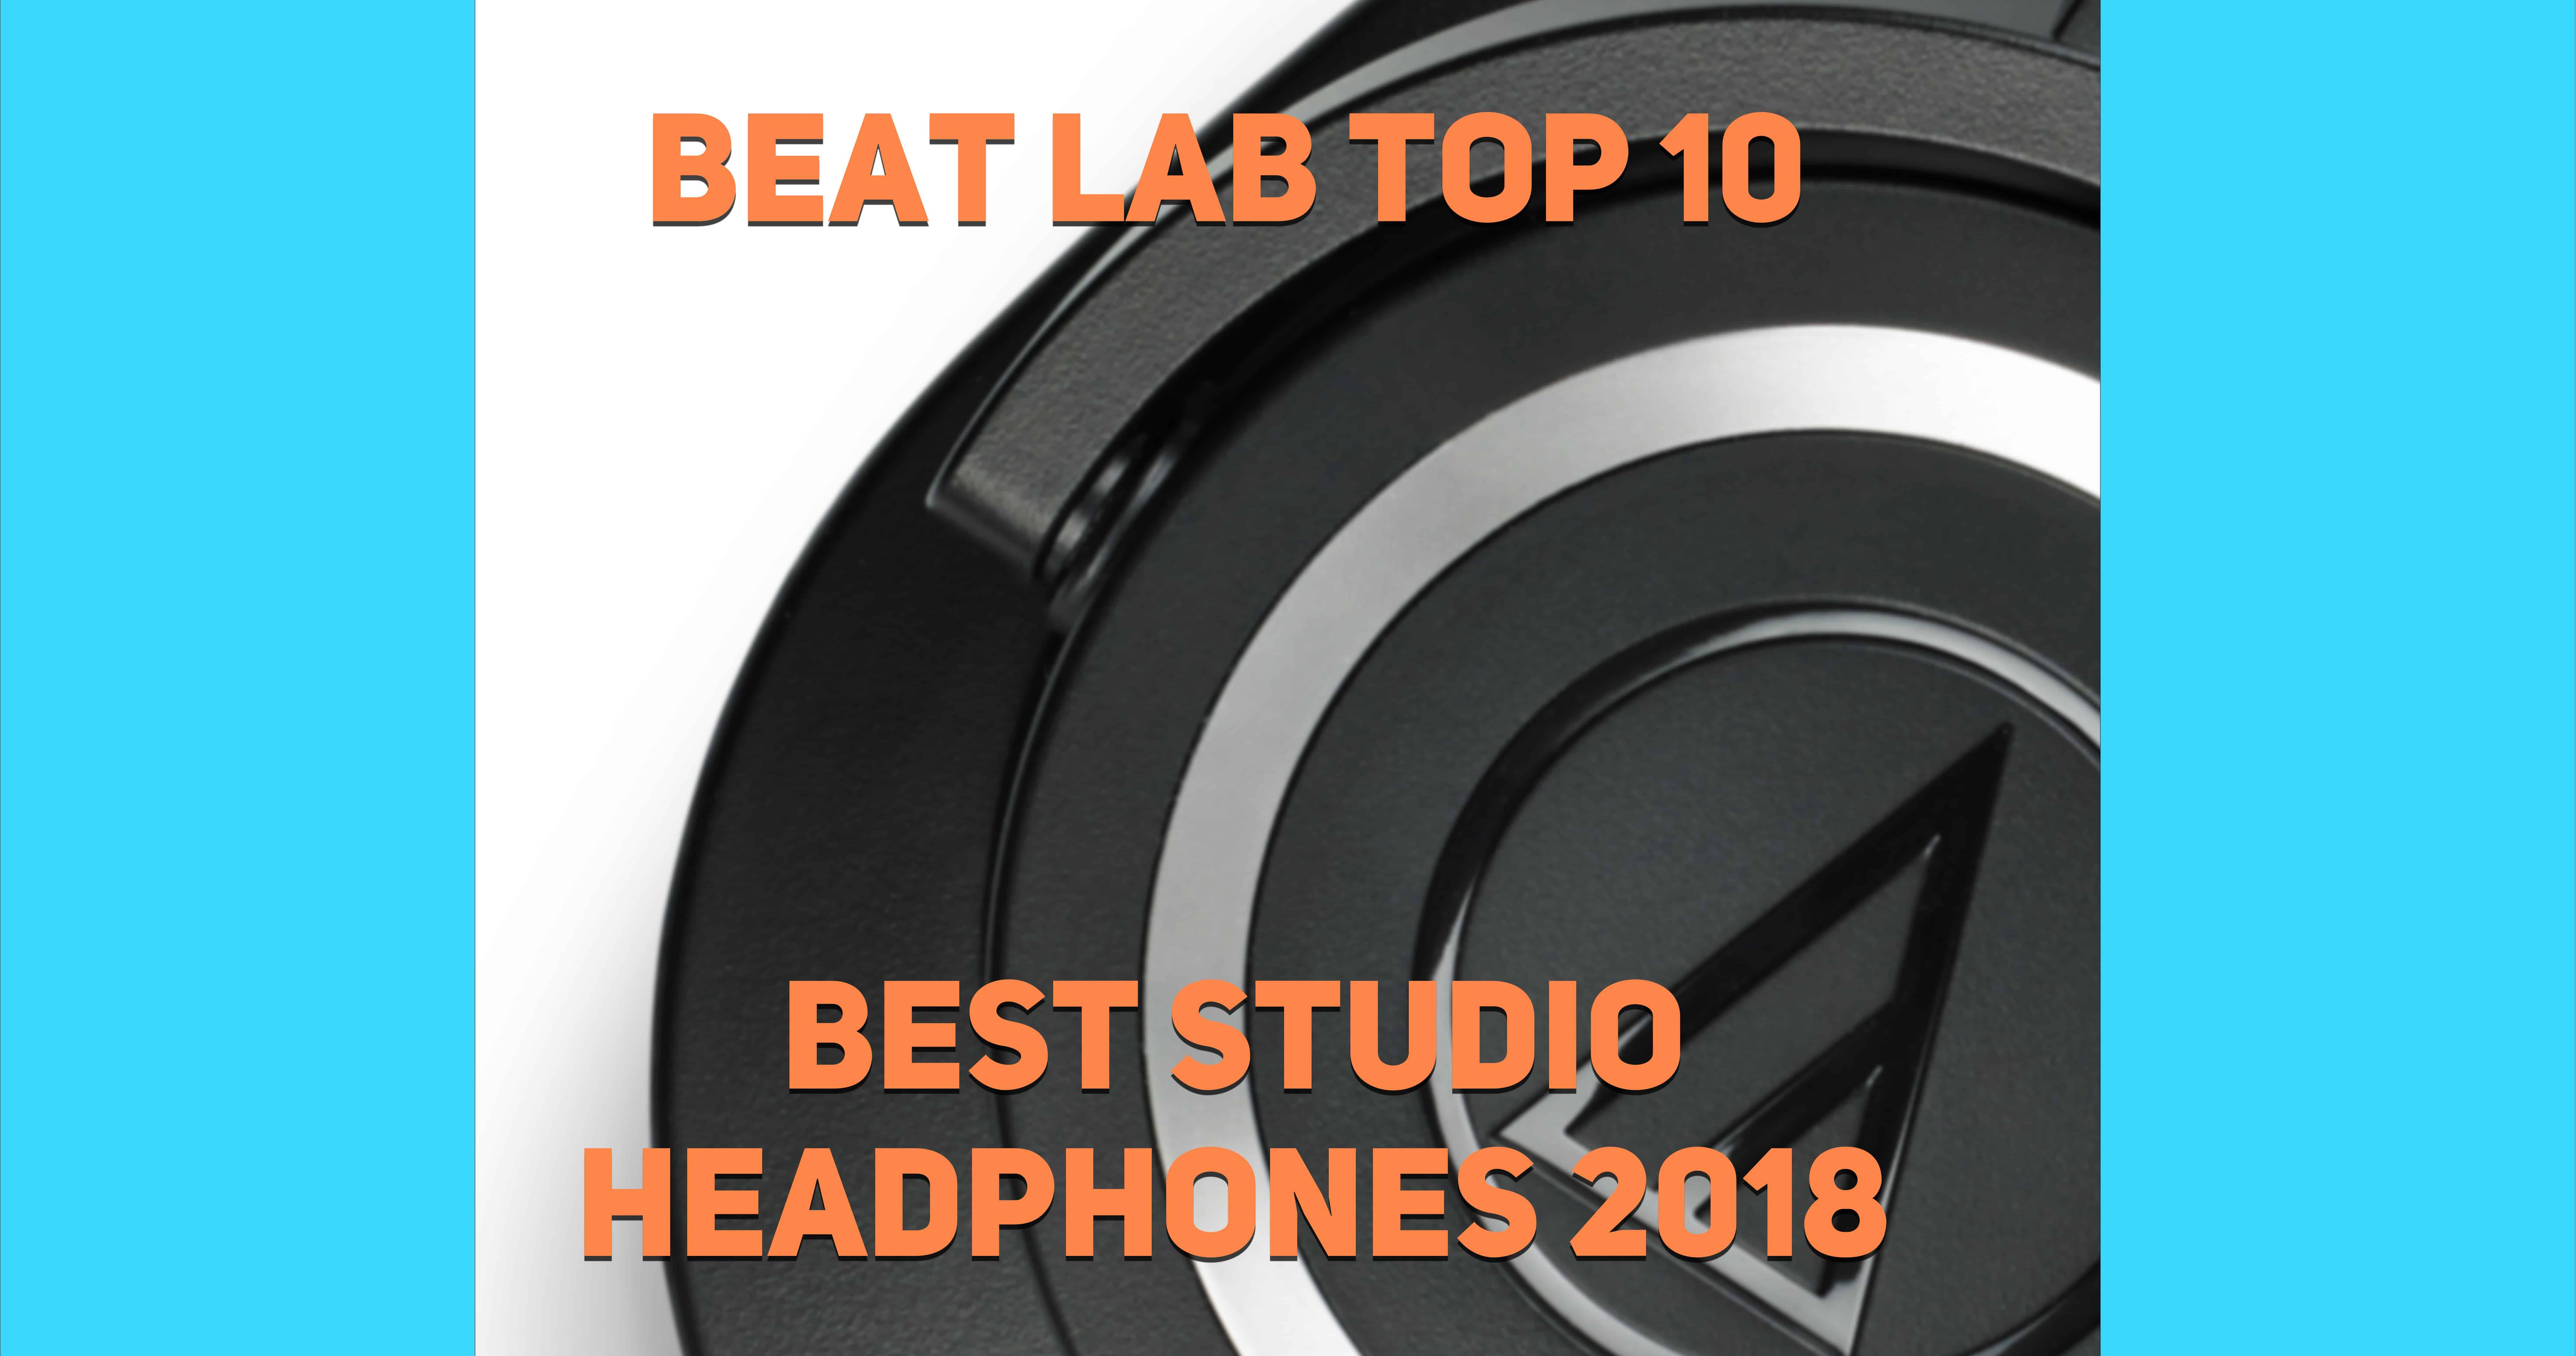 e8ea10357d2 Beat Lab Top 10: Best Studio Headphones 2018 | Beat Lab